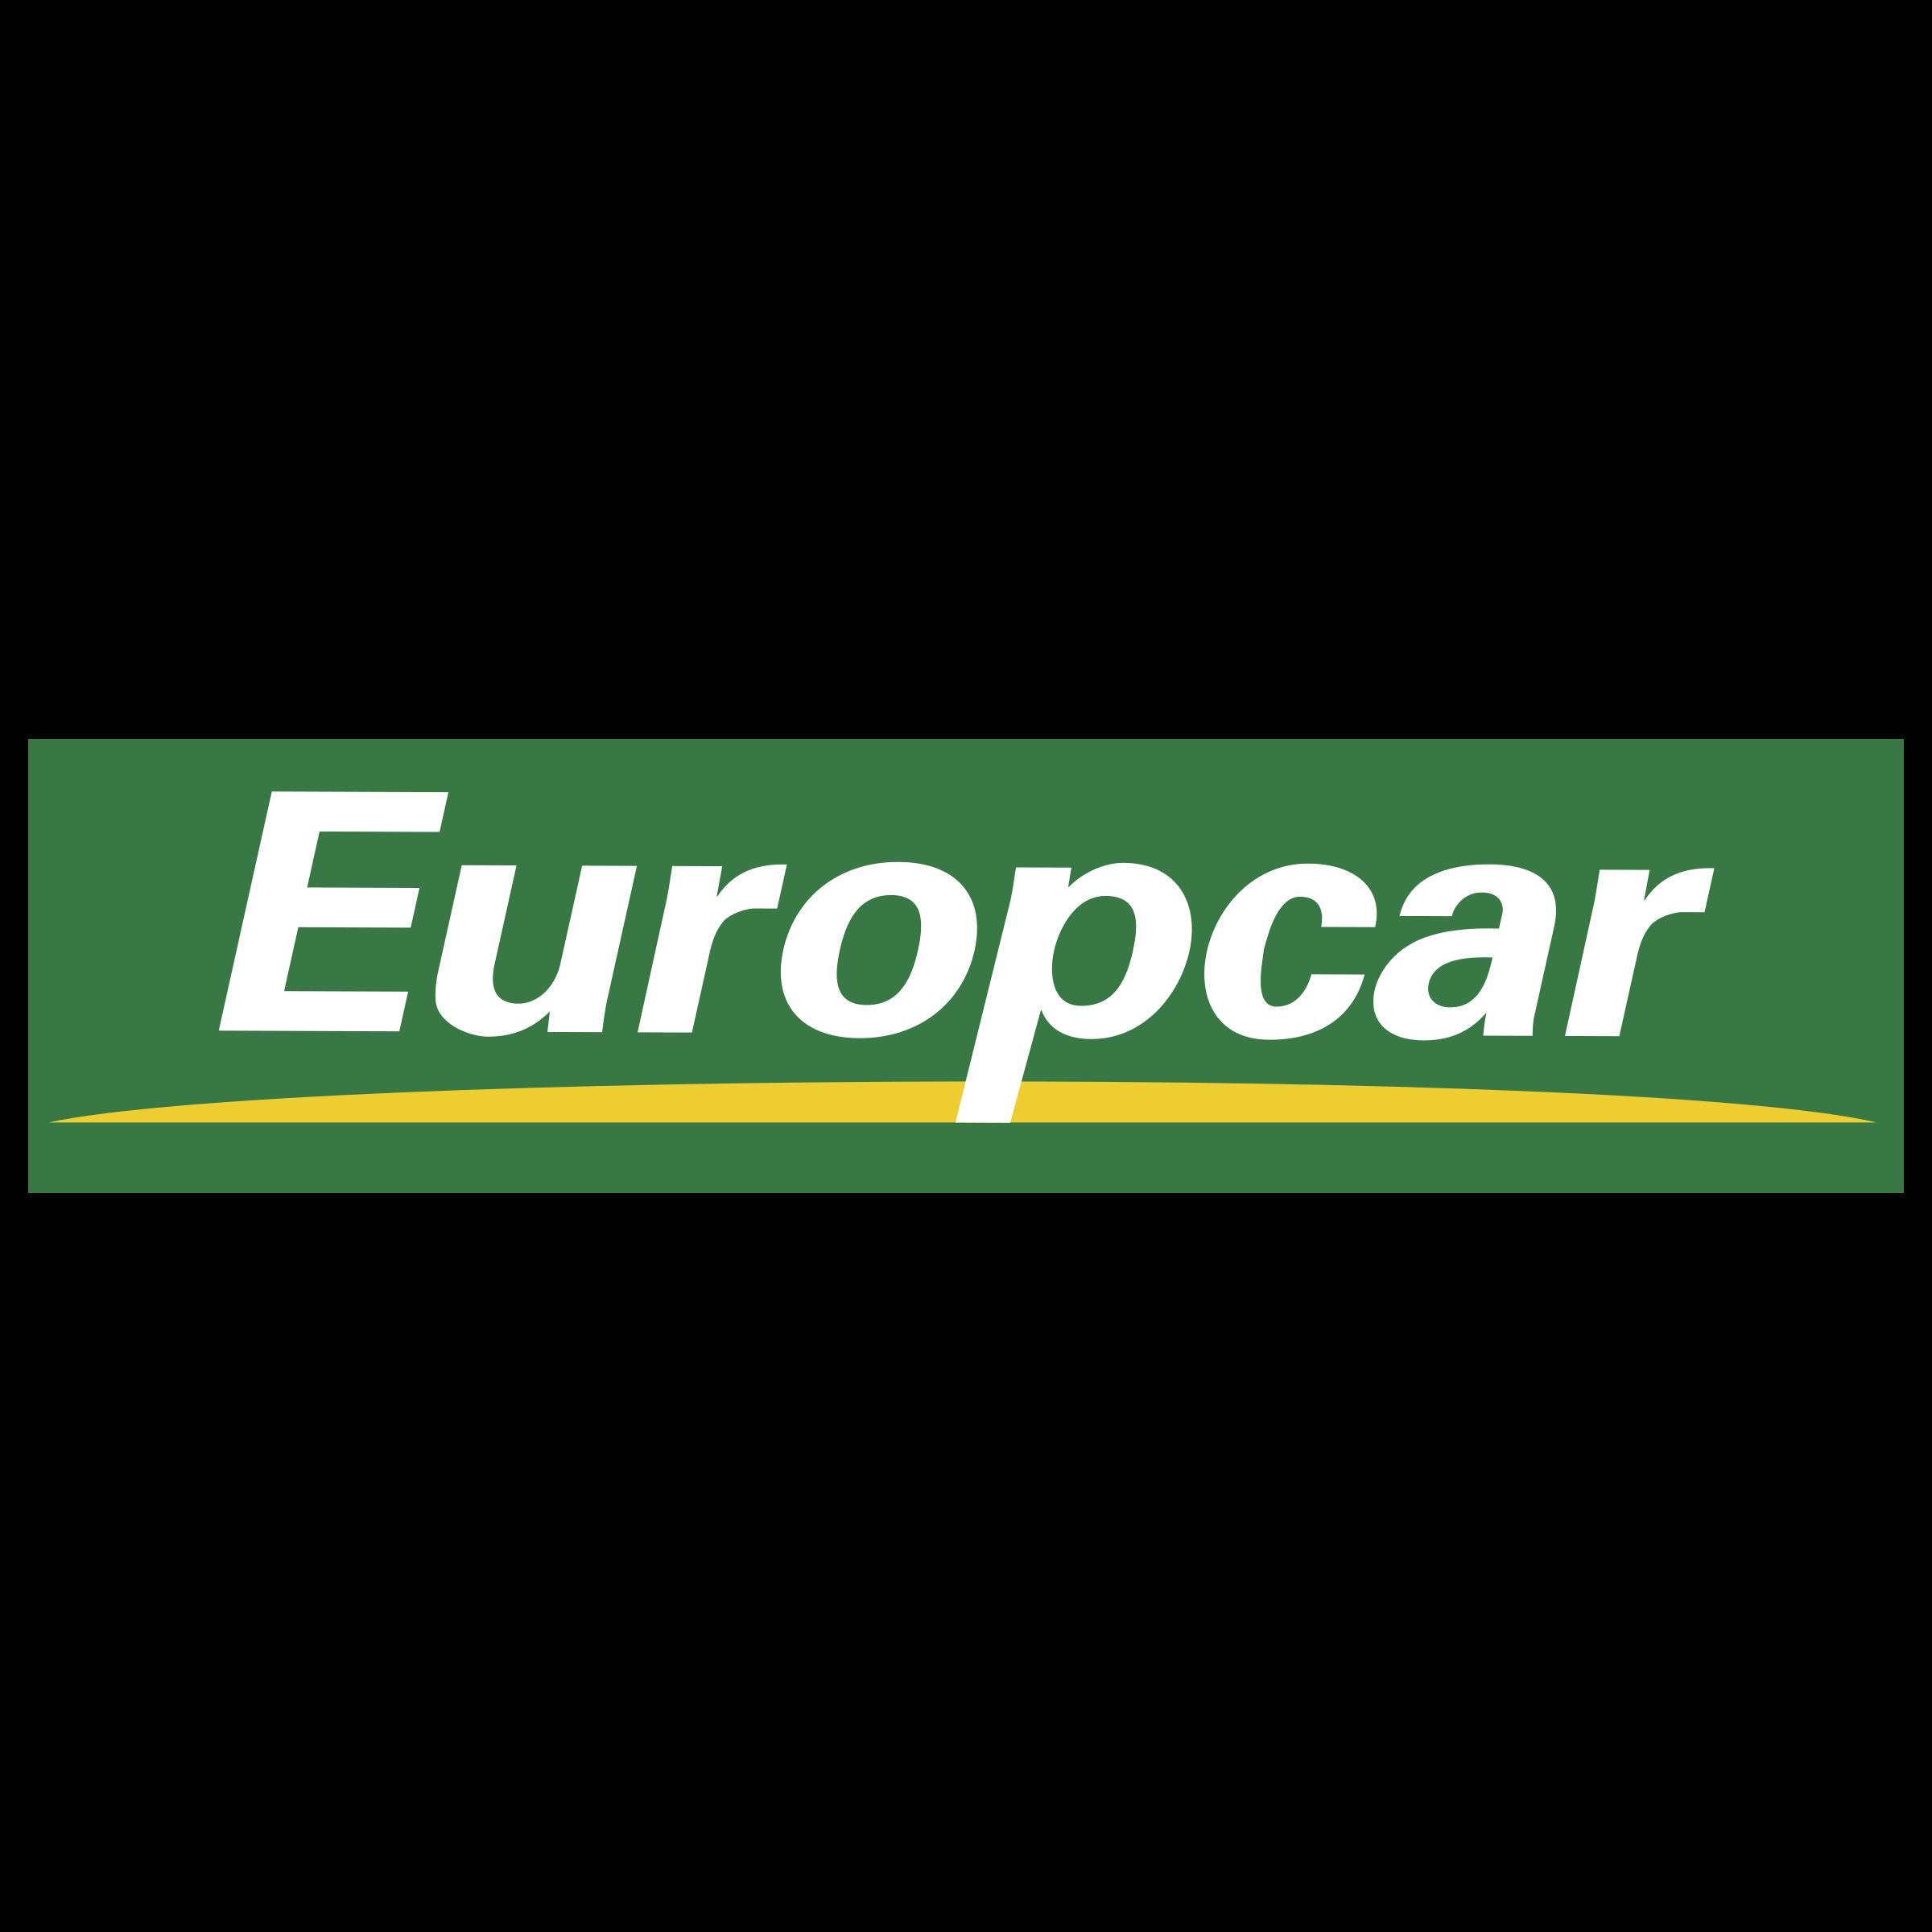 Europcar Logo PNG Transparent & SVG Vector.